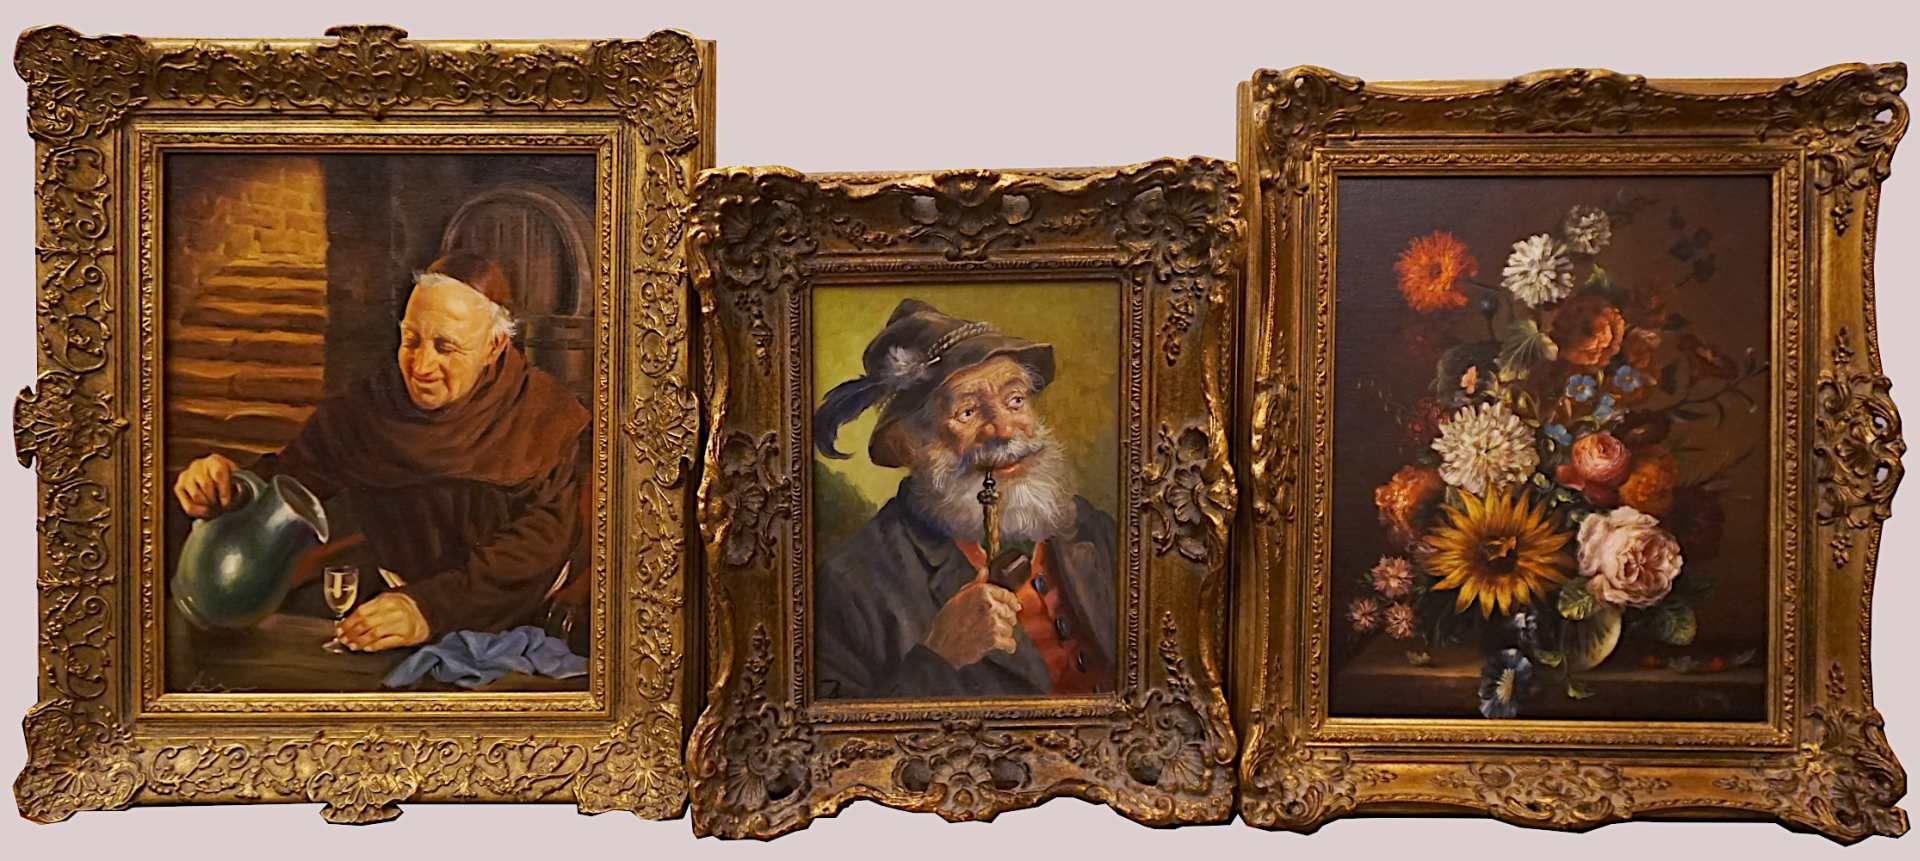 "1 Konv. Ölgemälde des 20. Jh., versch. Künstler, z.T. sign. F. RAHM: ""Beschattete A - Bild 3 aus 5"